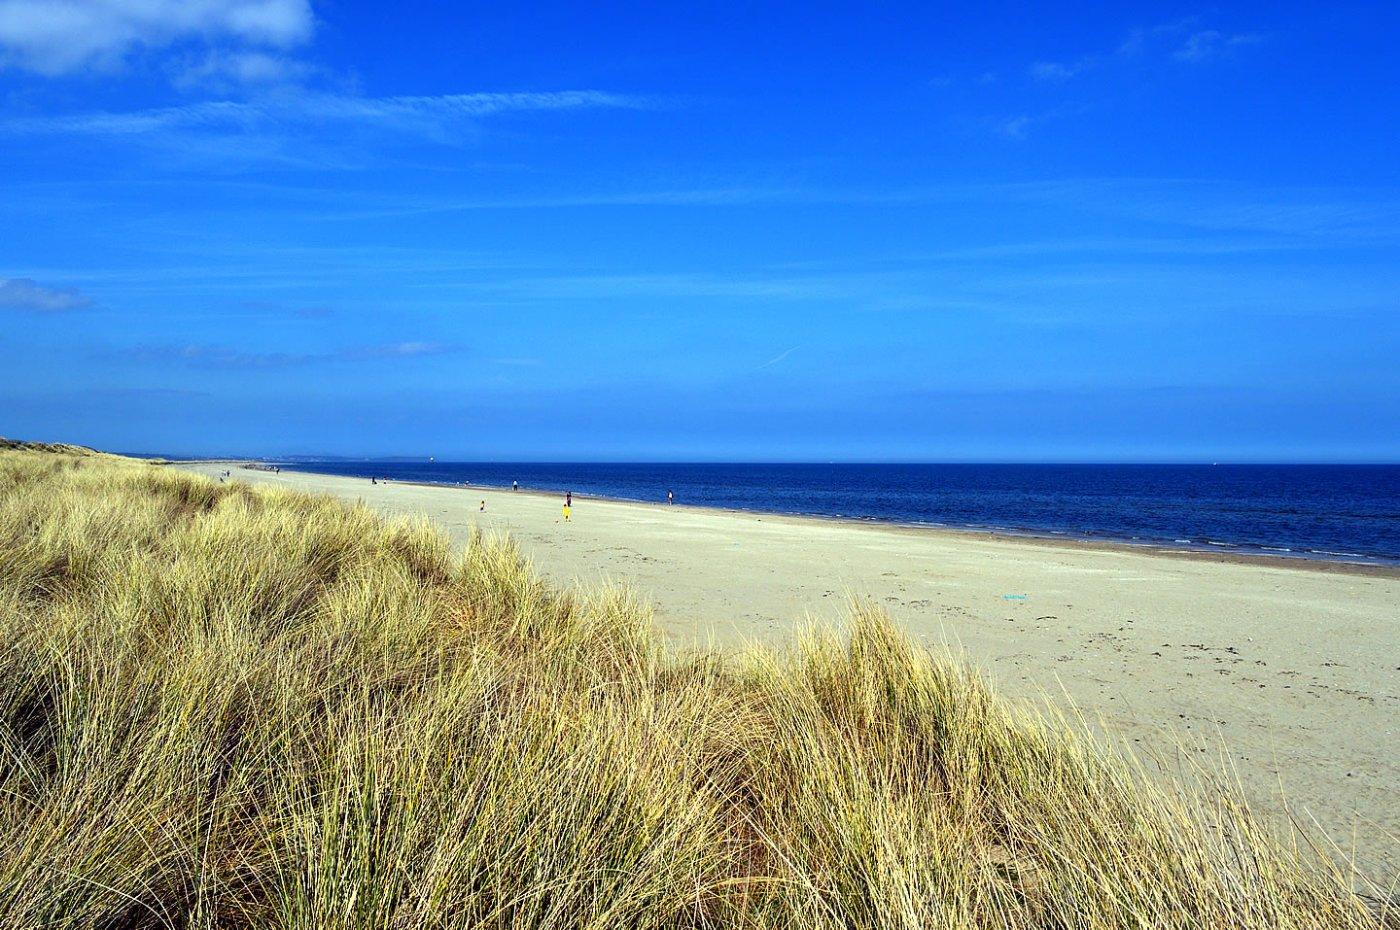 Bettystown Beach, Co. Meath, Ireland